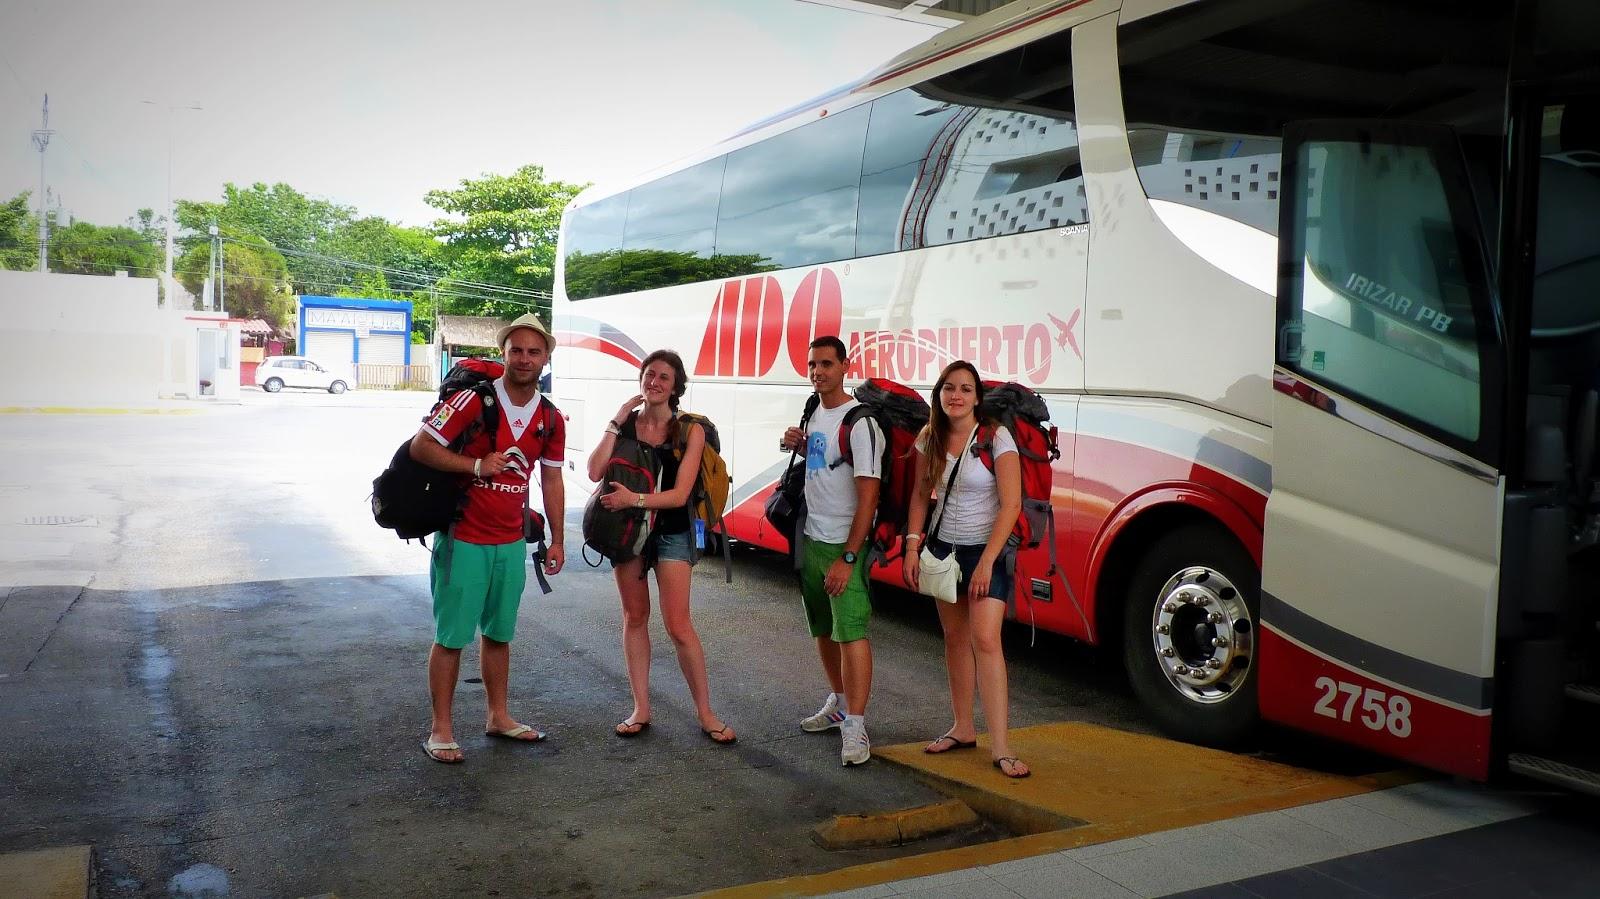 autobuses ado aeropuerto